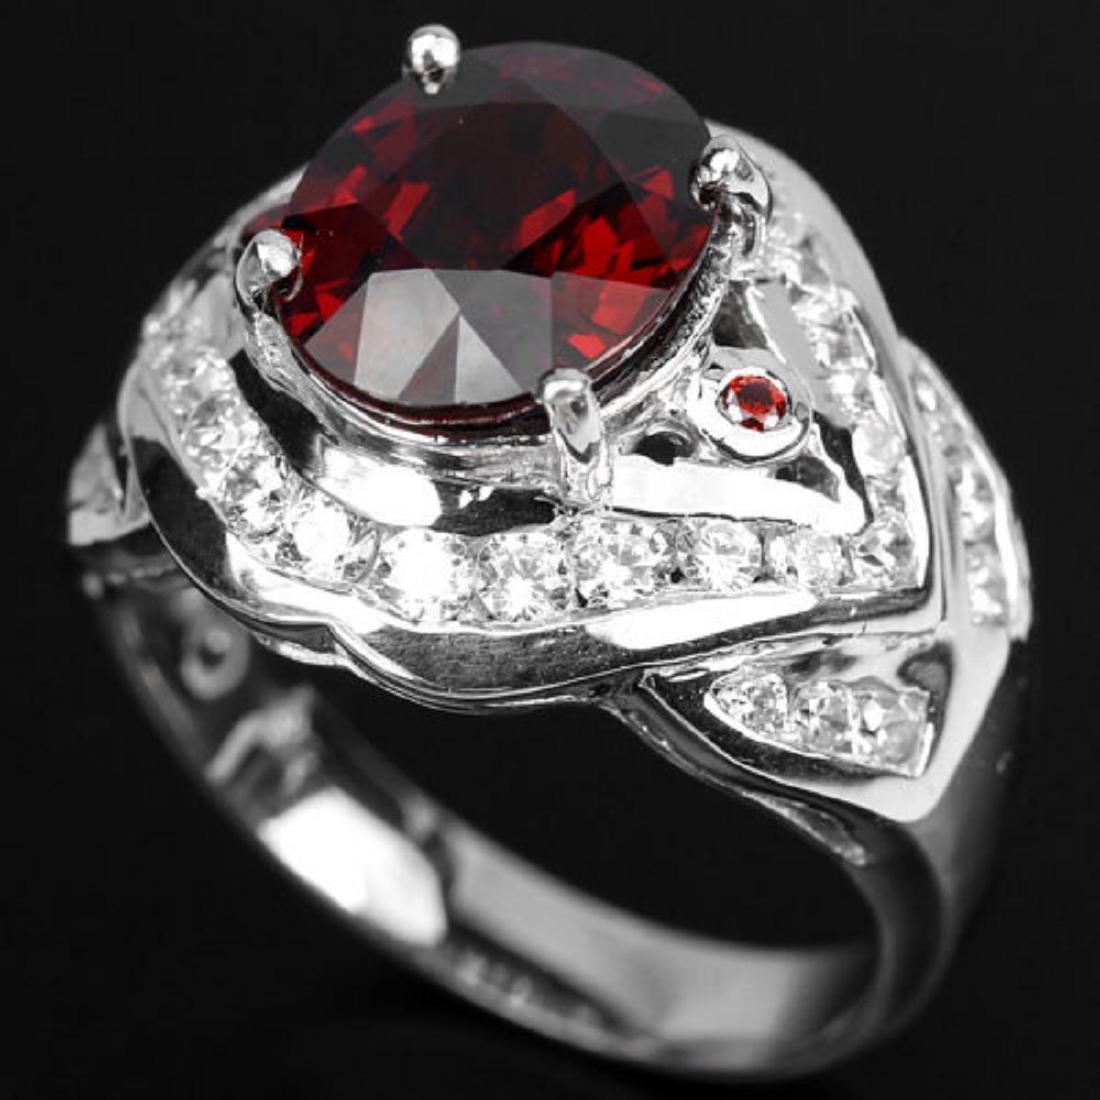 NATURAL RED SPESSARTITE GARNET Ring - 2